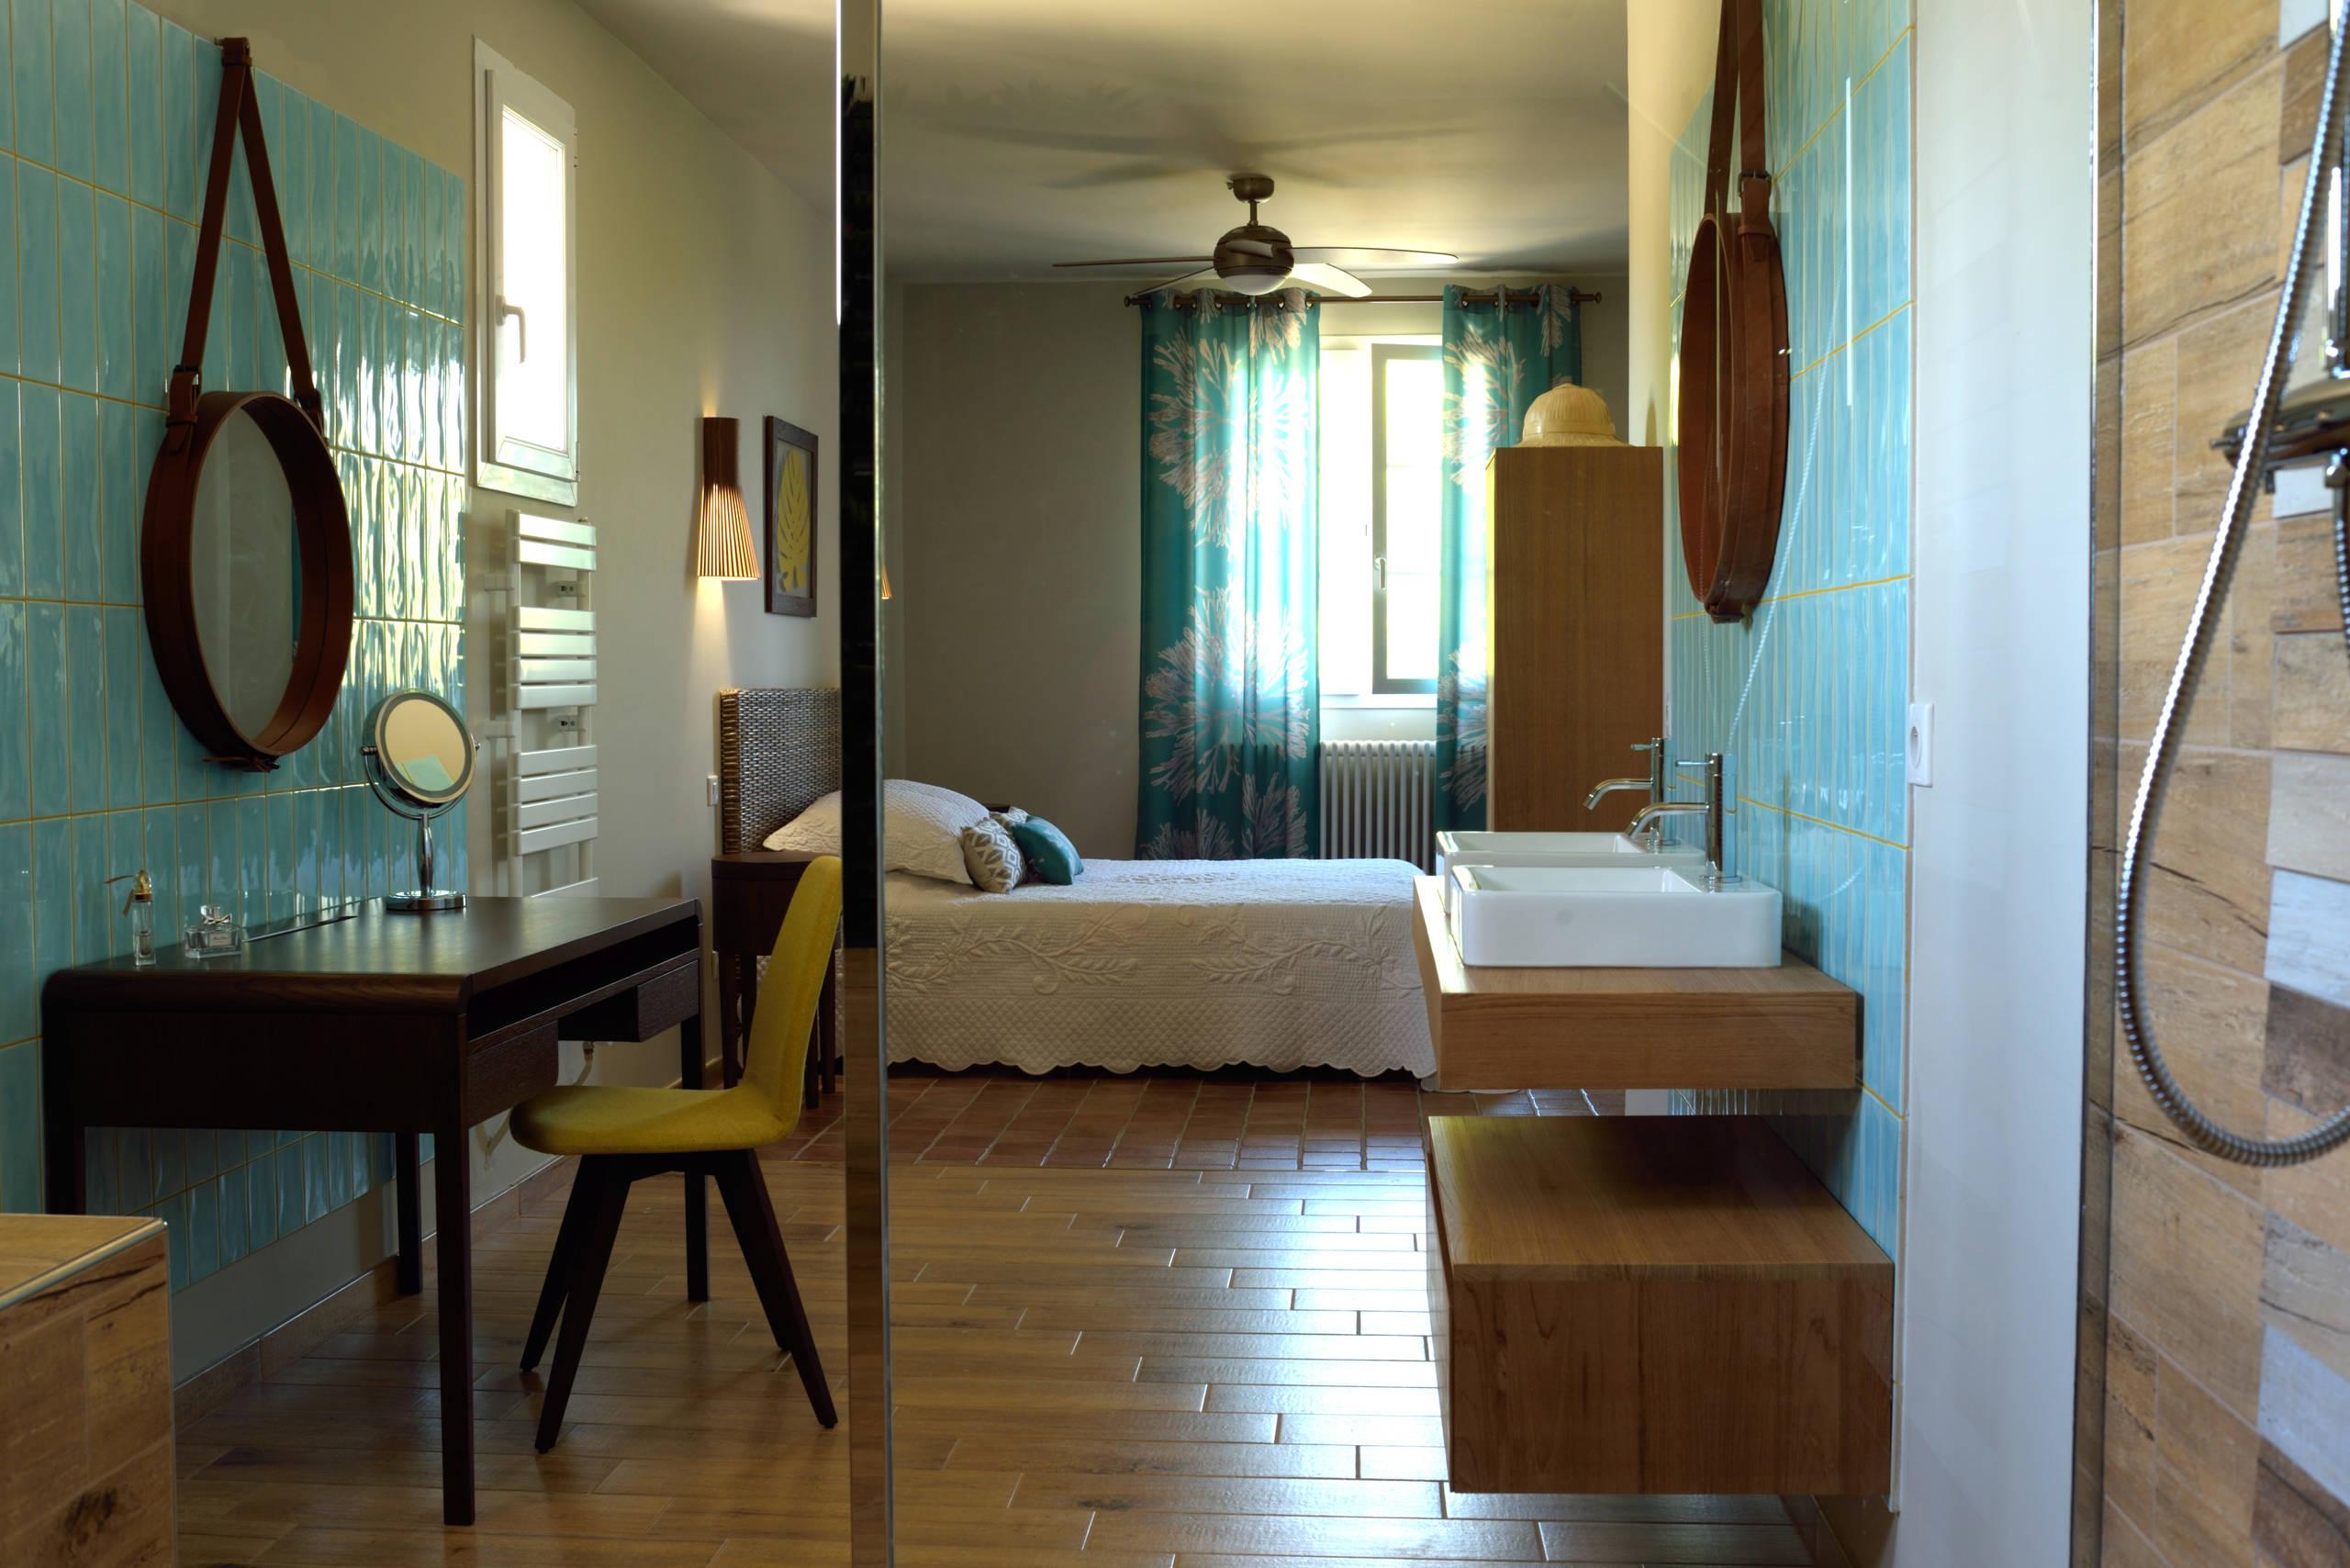 Carrelage Imitation Parquet 30X60 75 beautiful tropical terra-cotta floor bedroom pictures